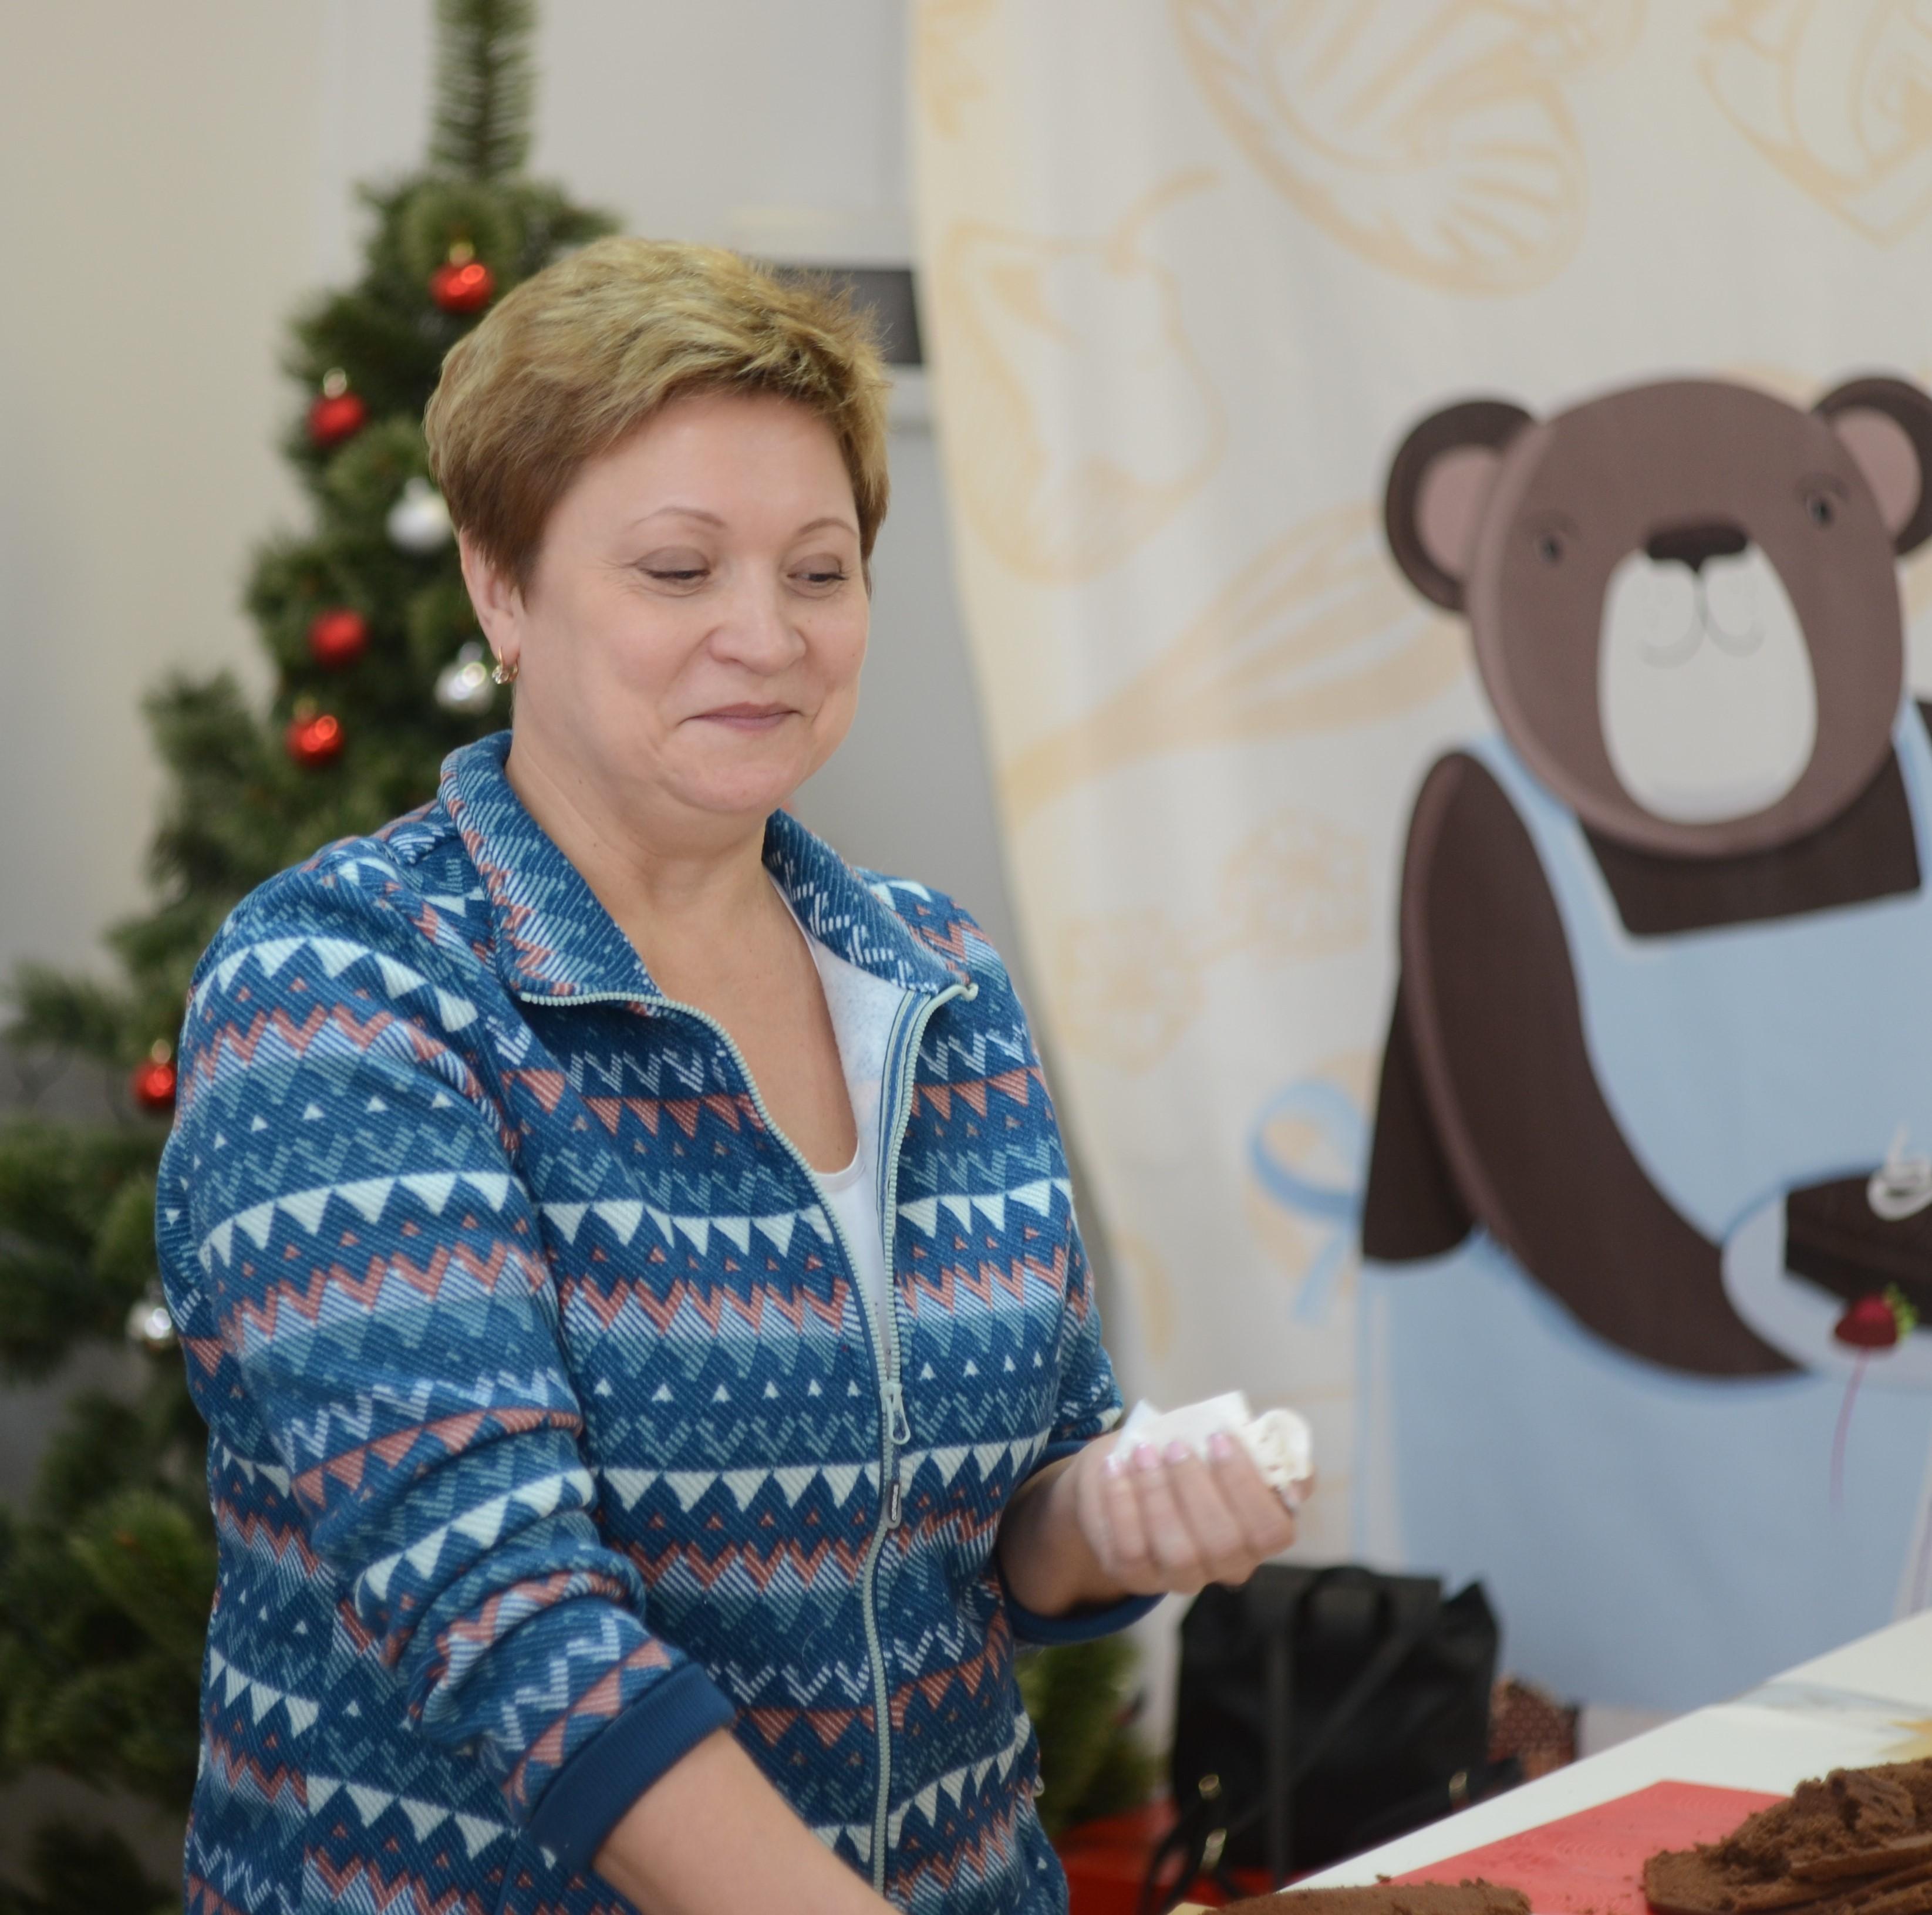 http://odry-school.ru/images/upload/DSC_0369.JPG